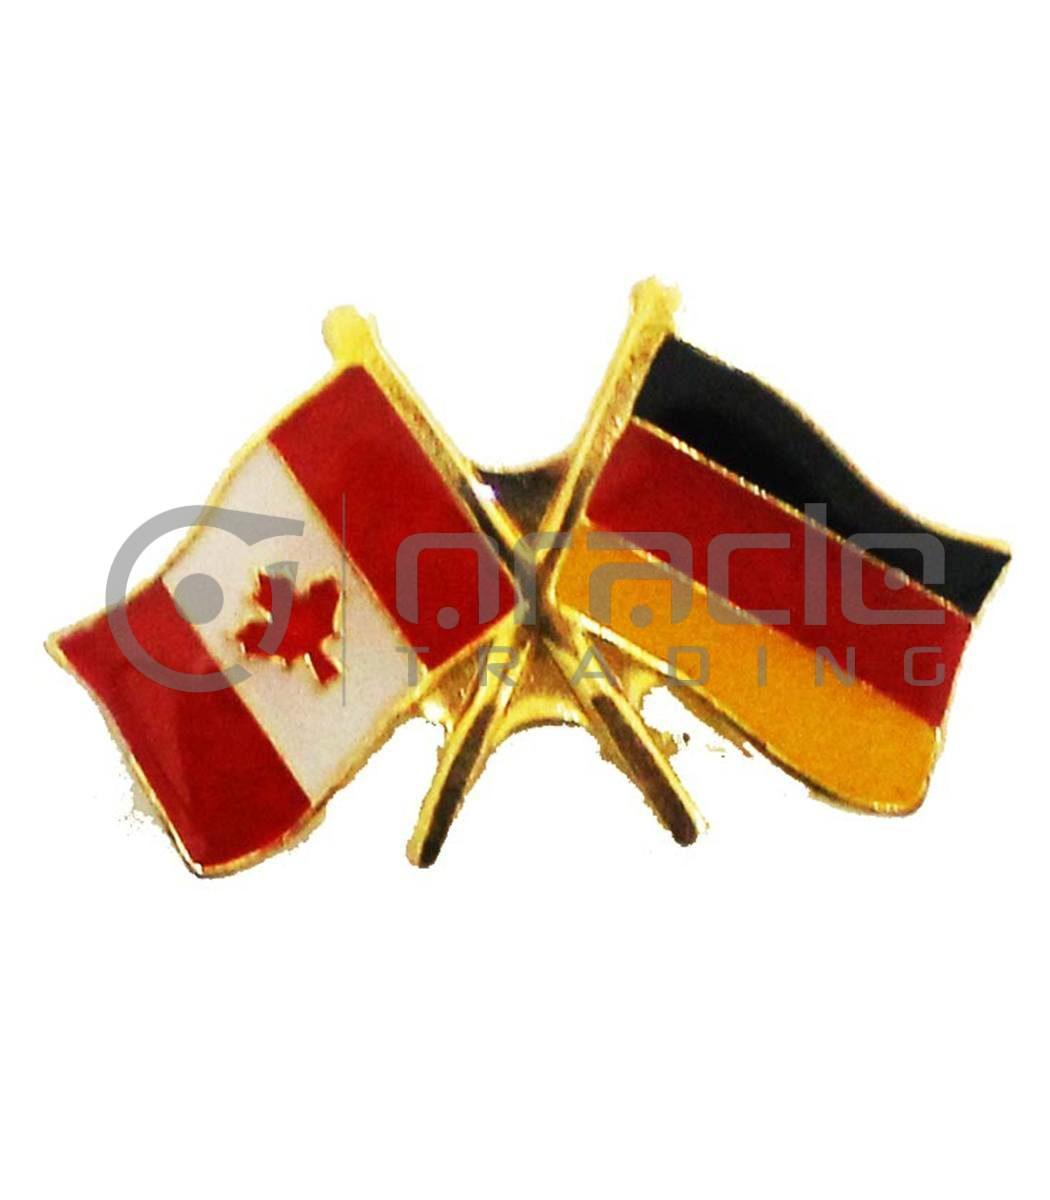 Germany / Canada Friendship Lapel Pin